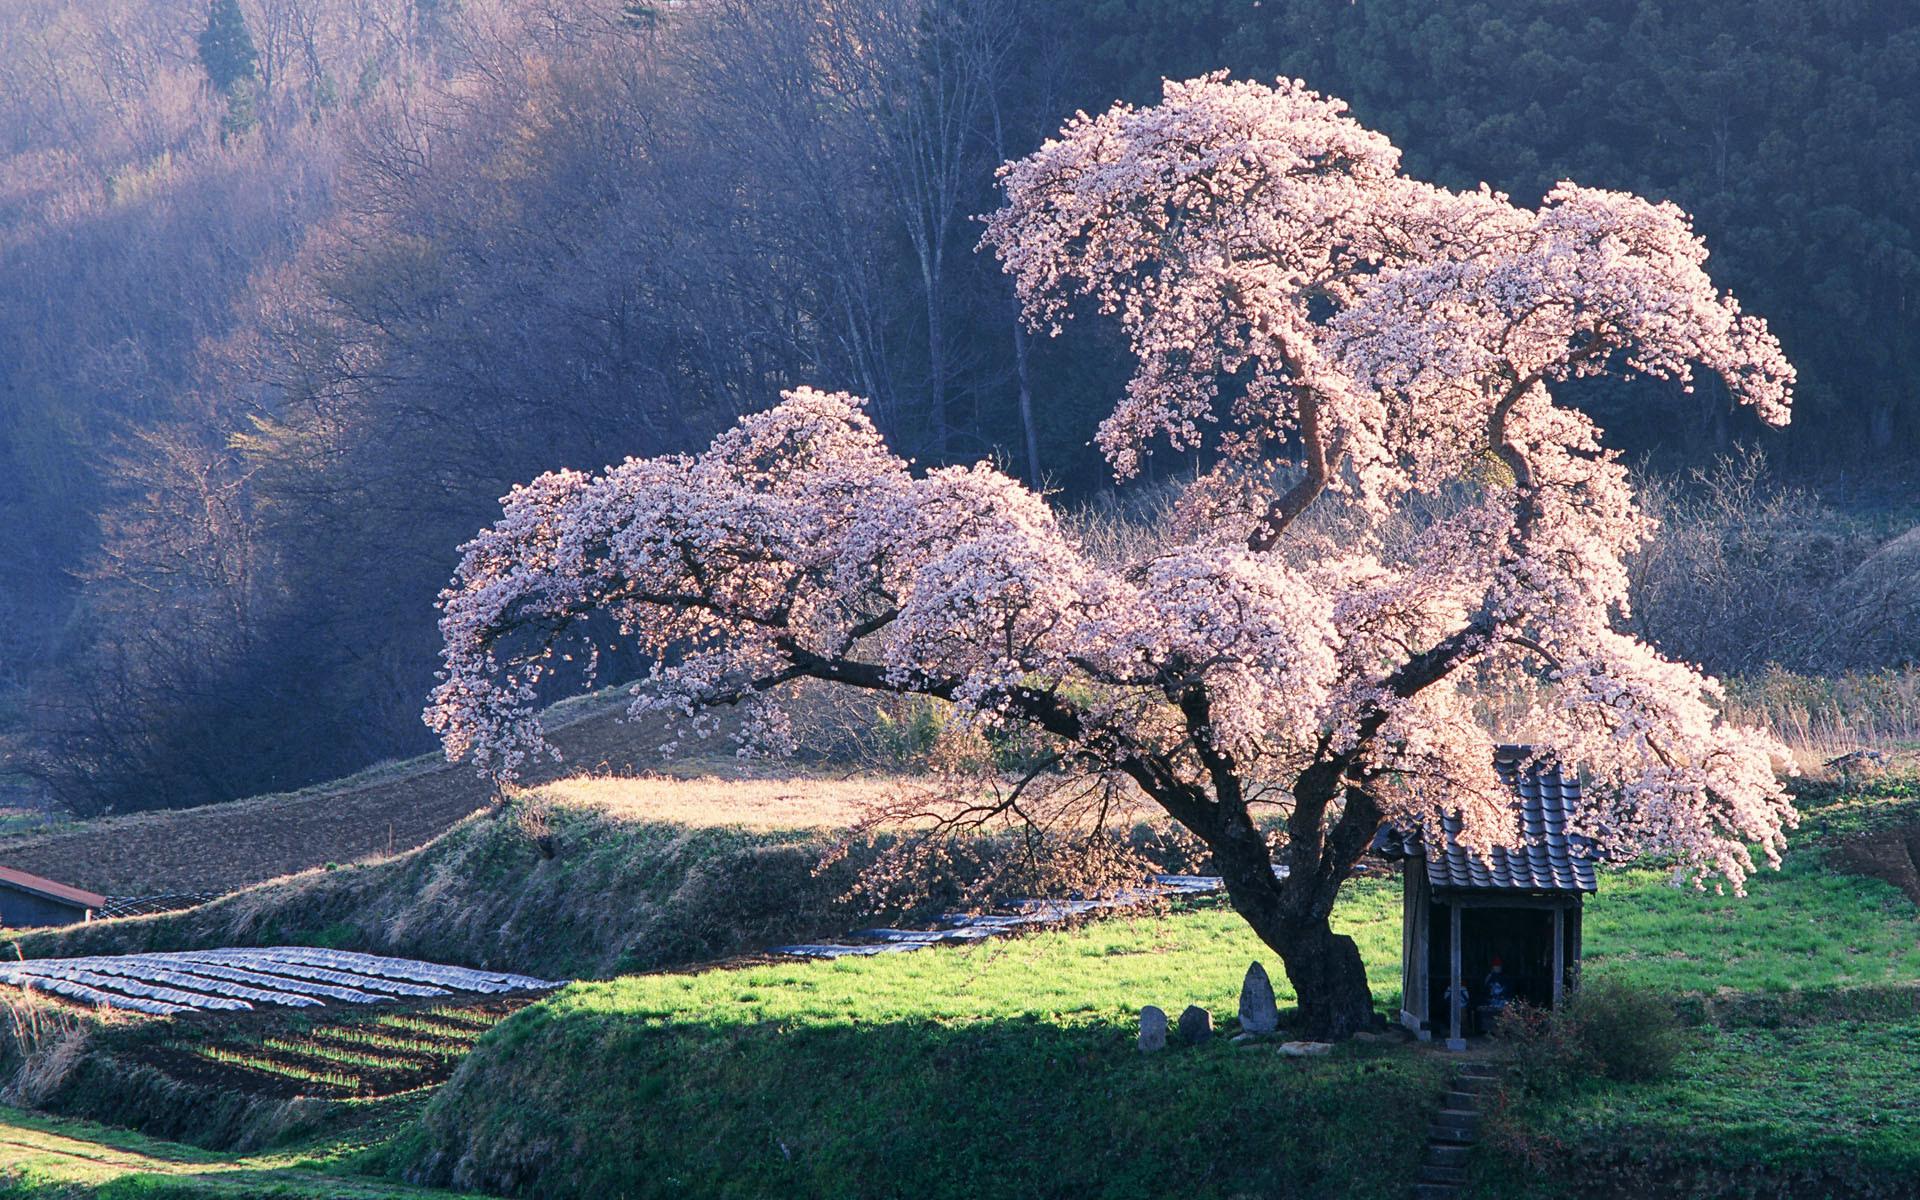 Cherry Blossom Tree Desktop Wallpaper Free Wid Full HD Wide